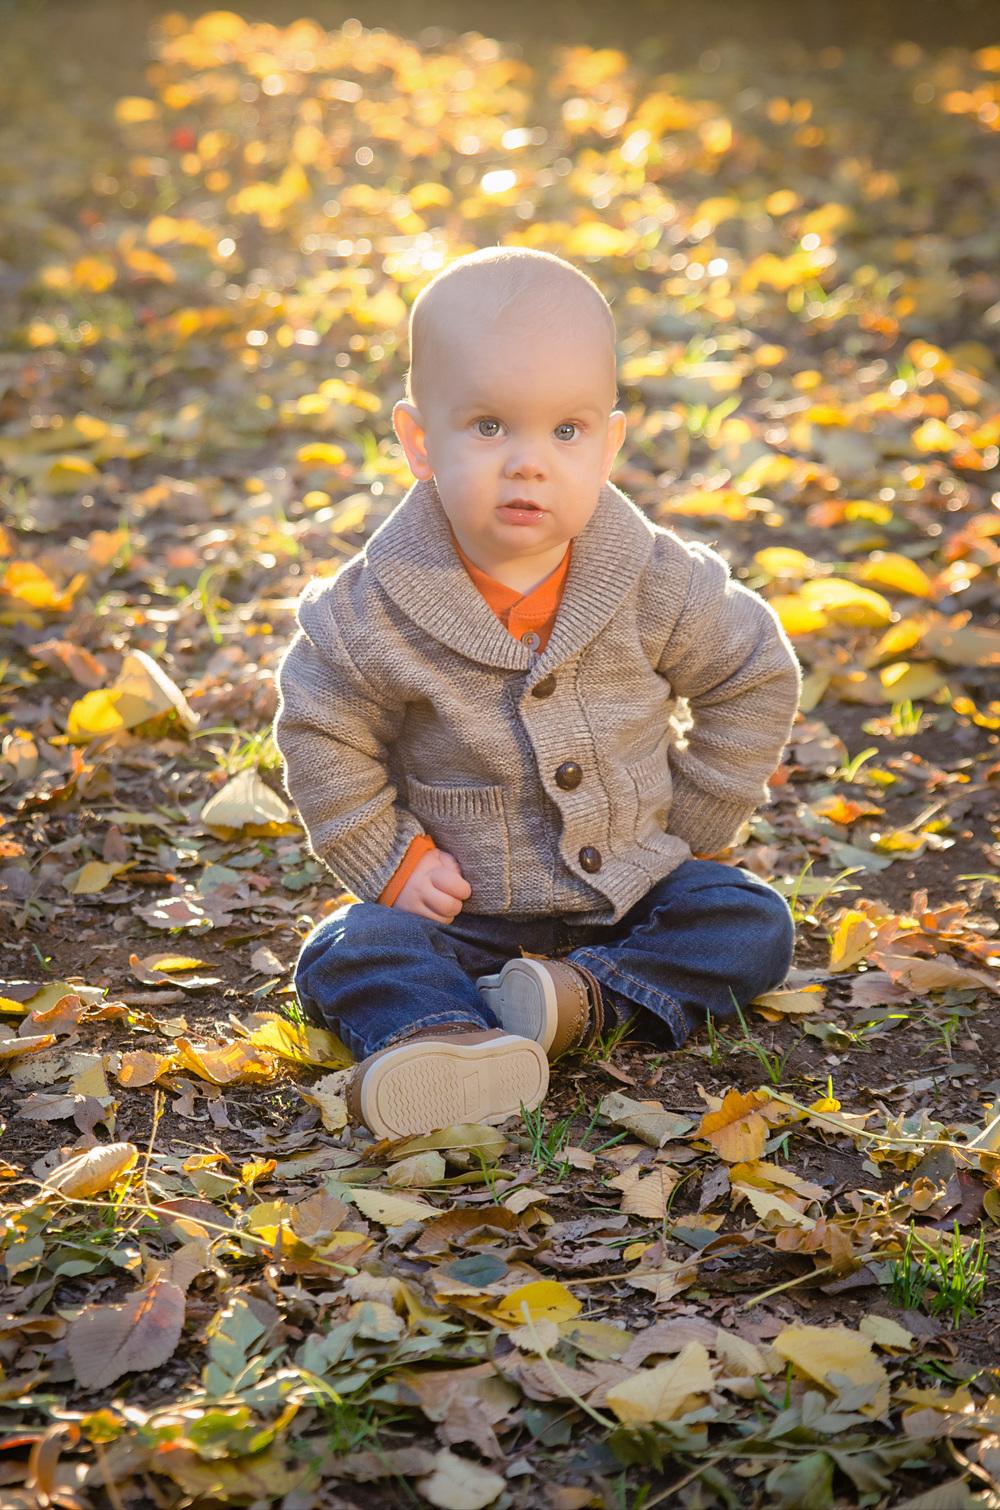 dallas children'sportrait photography by Stephanie Ray